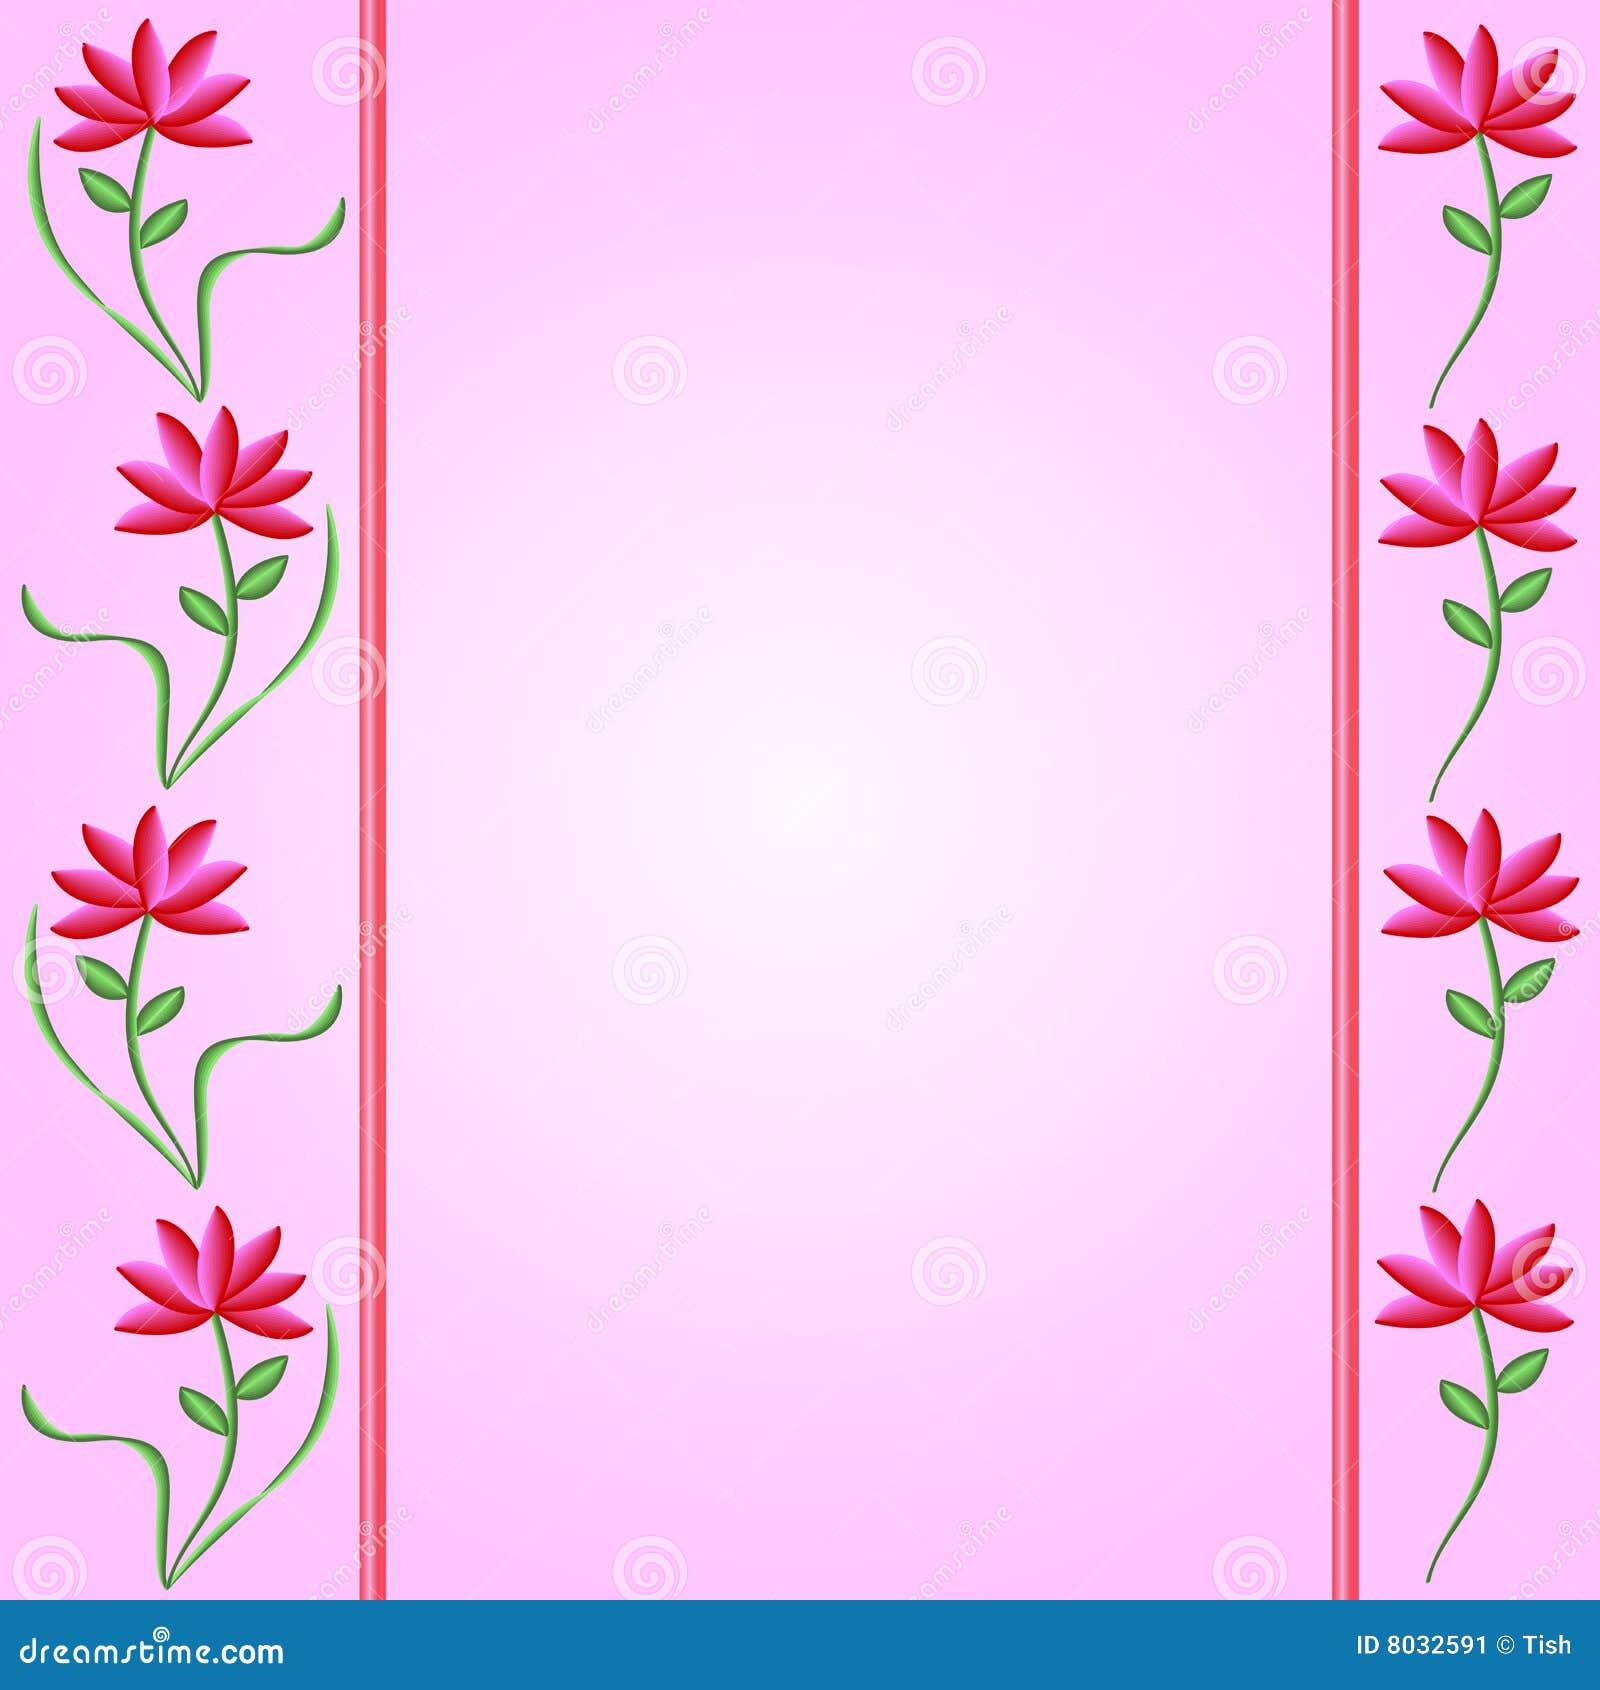 Flower borders on pink gradient background illustration 8032591 flower borders on pink gradient background illustration 8032591 megapixl mightylinksfo